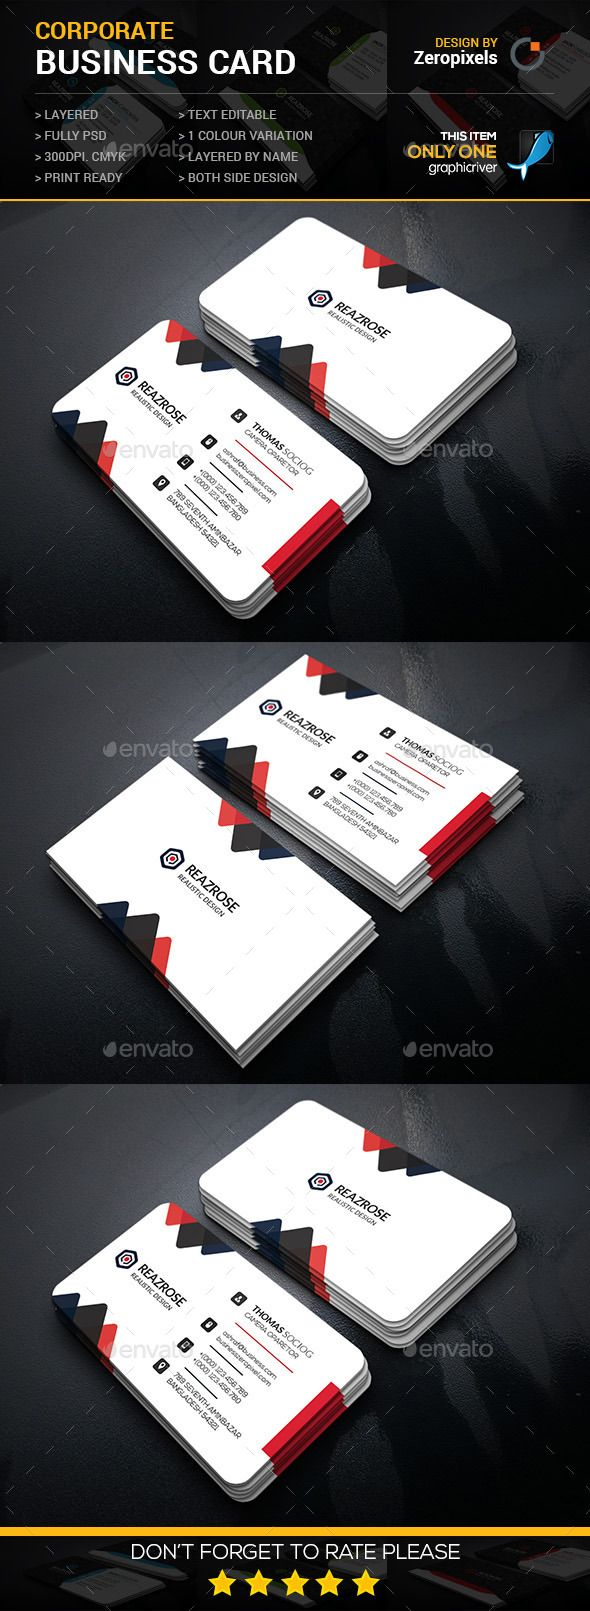 100 Best Name Card Images On Pinterest Business Card Design